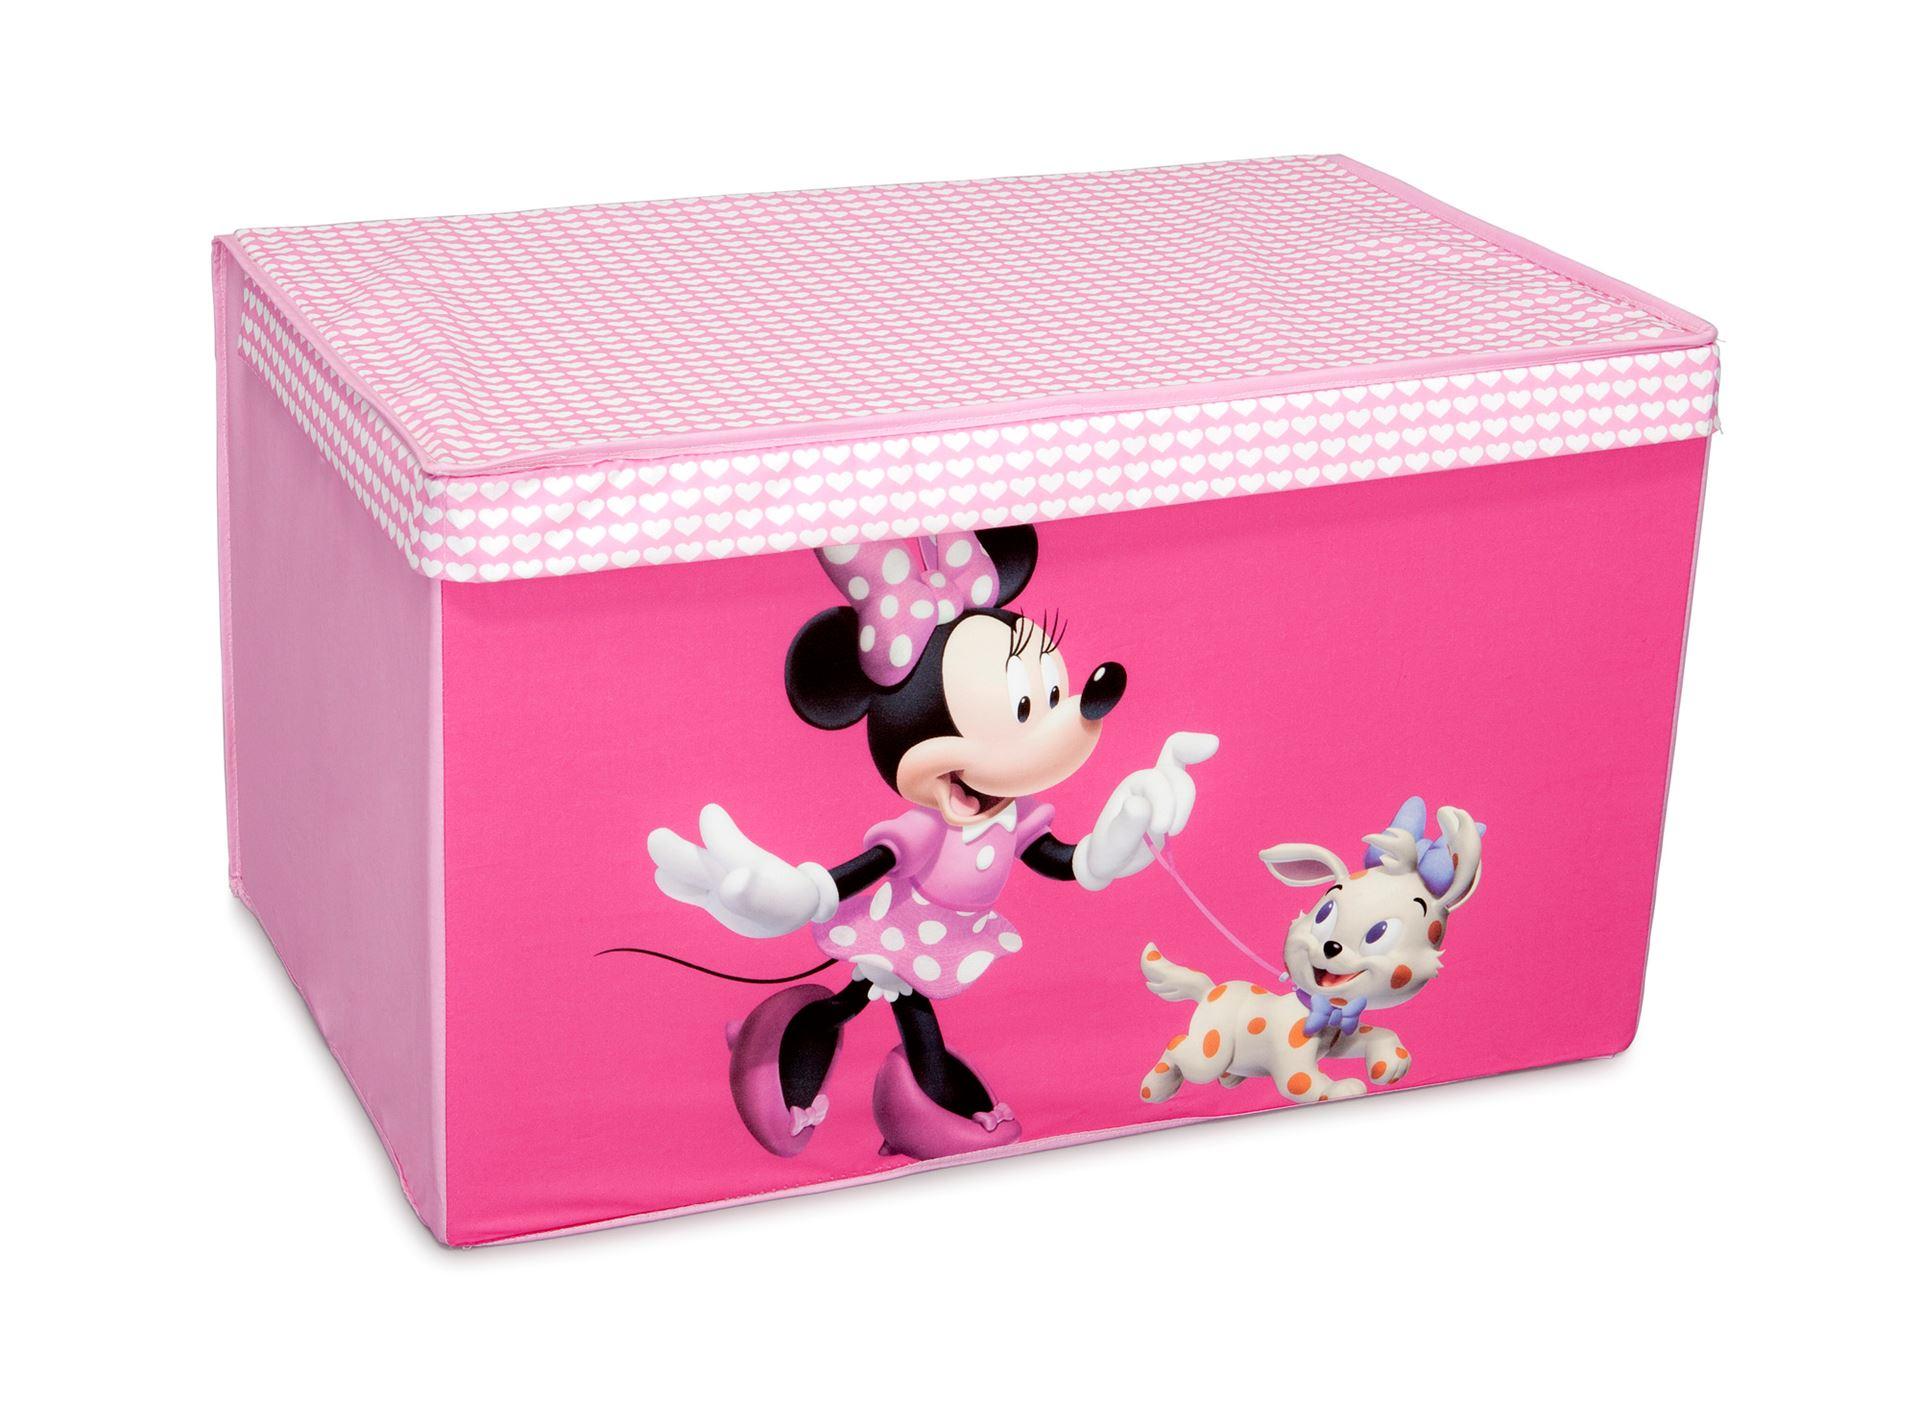 Dětská látková truhla Minnie